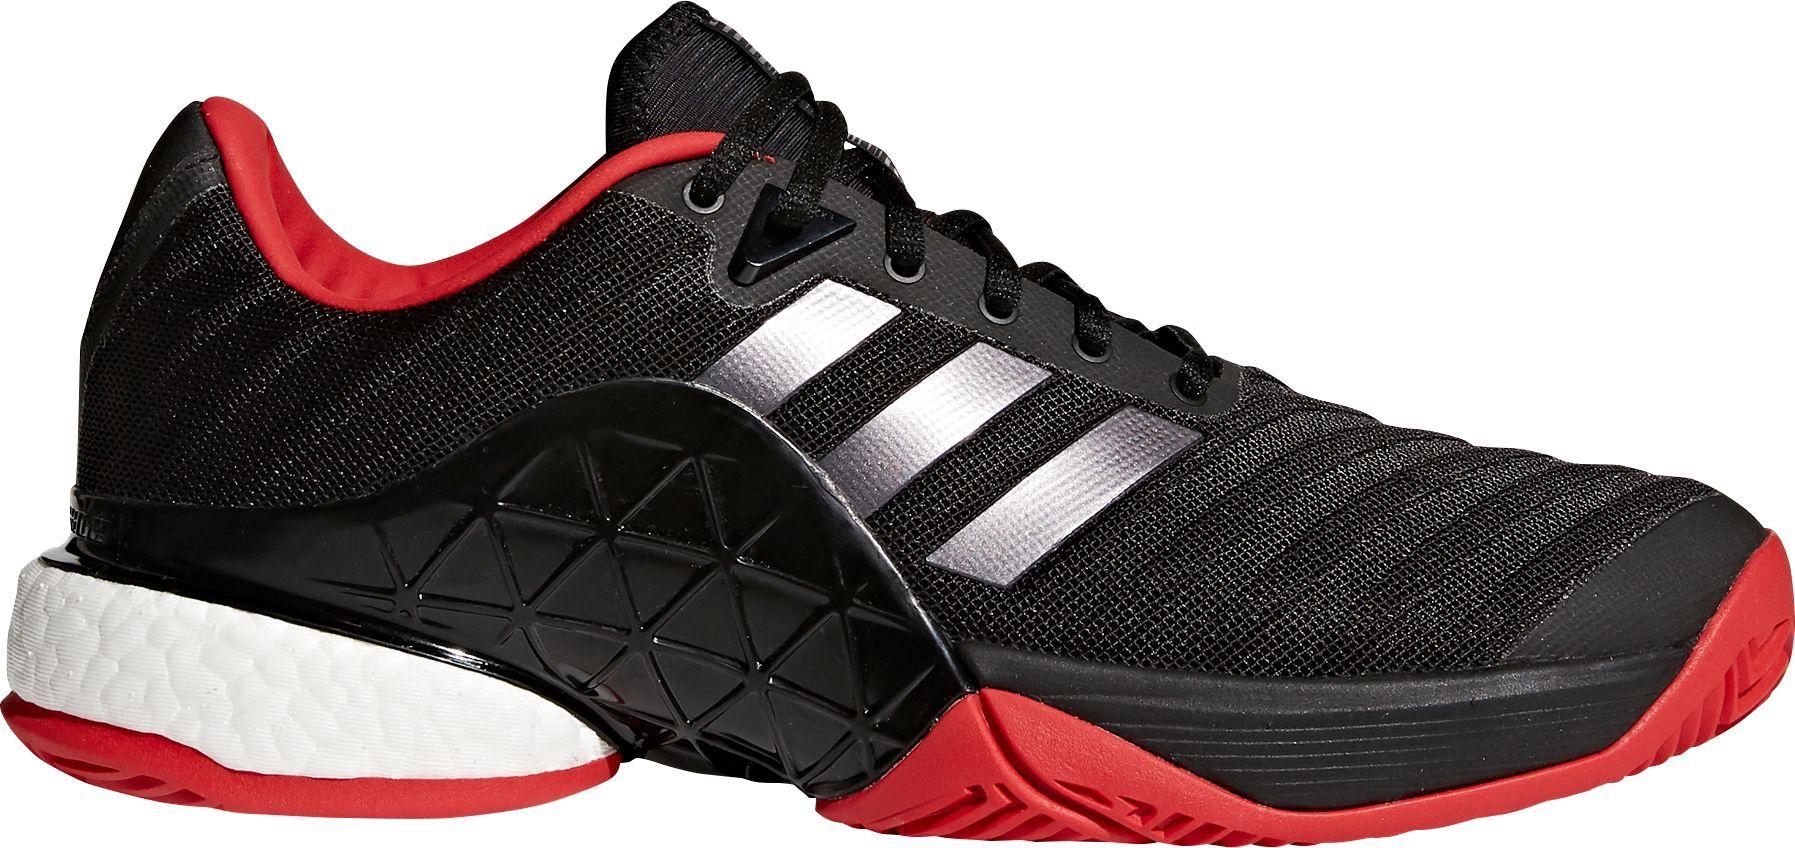 4614239a4699e adidas Men s Barricade 2018 Boost Tennis Shoes